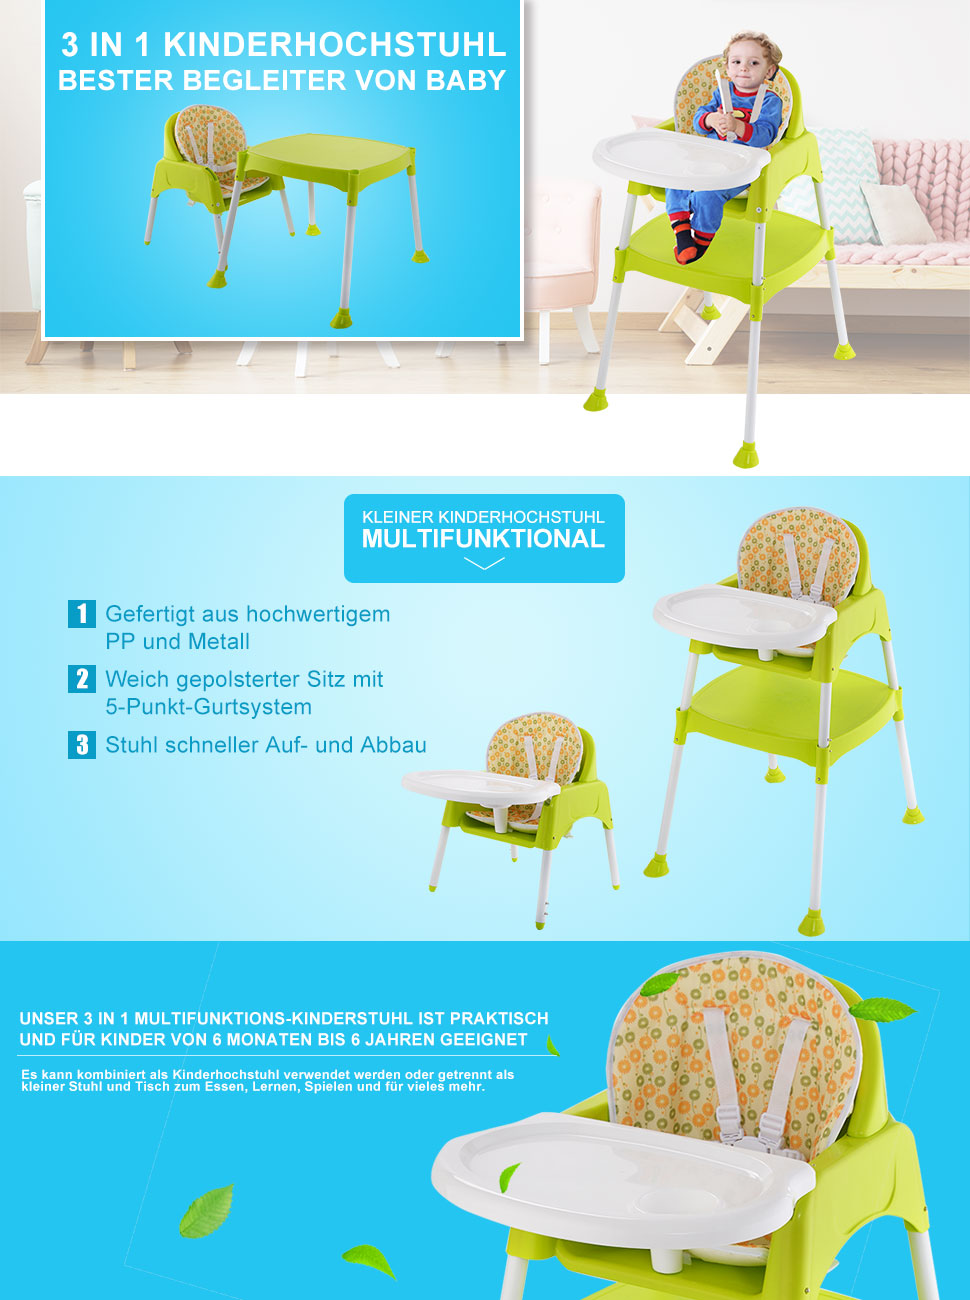 costway 3 in 1 kinderhochstuhl hochstuhl babystuhl babyhochstuhl multi kombihochstuhl. Black Bedroom Furniture Sets. Home Design Ideas